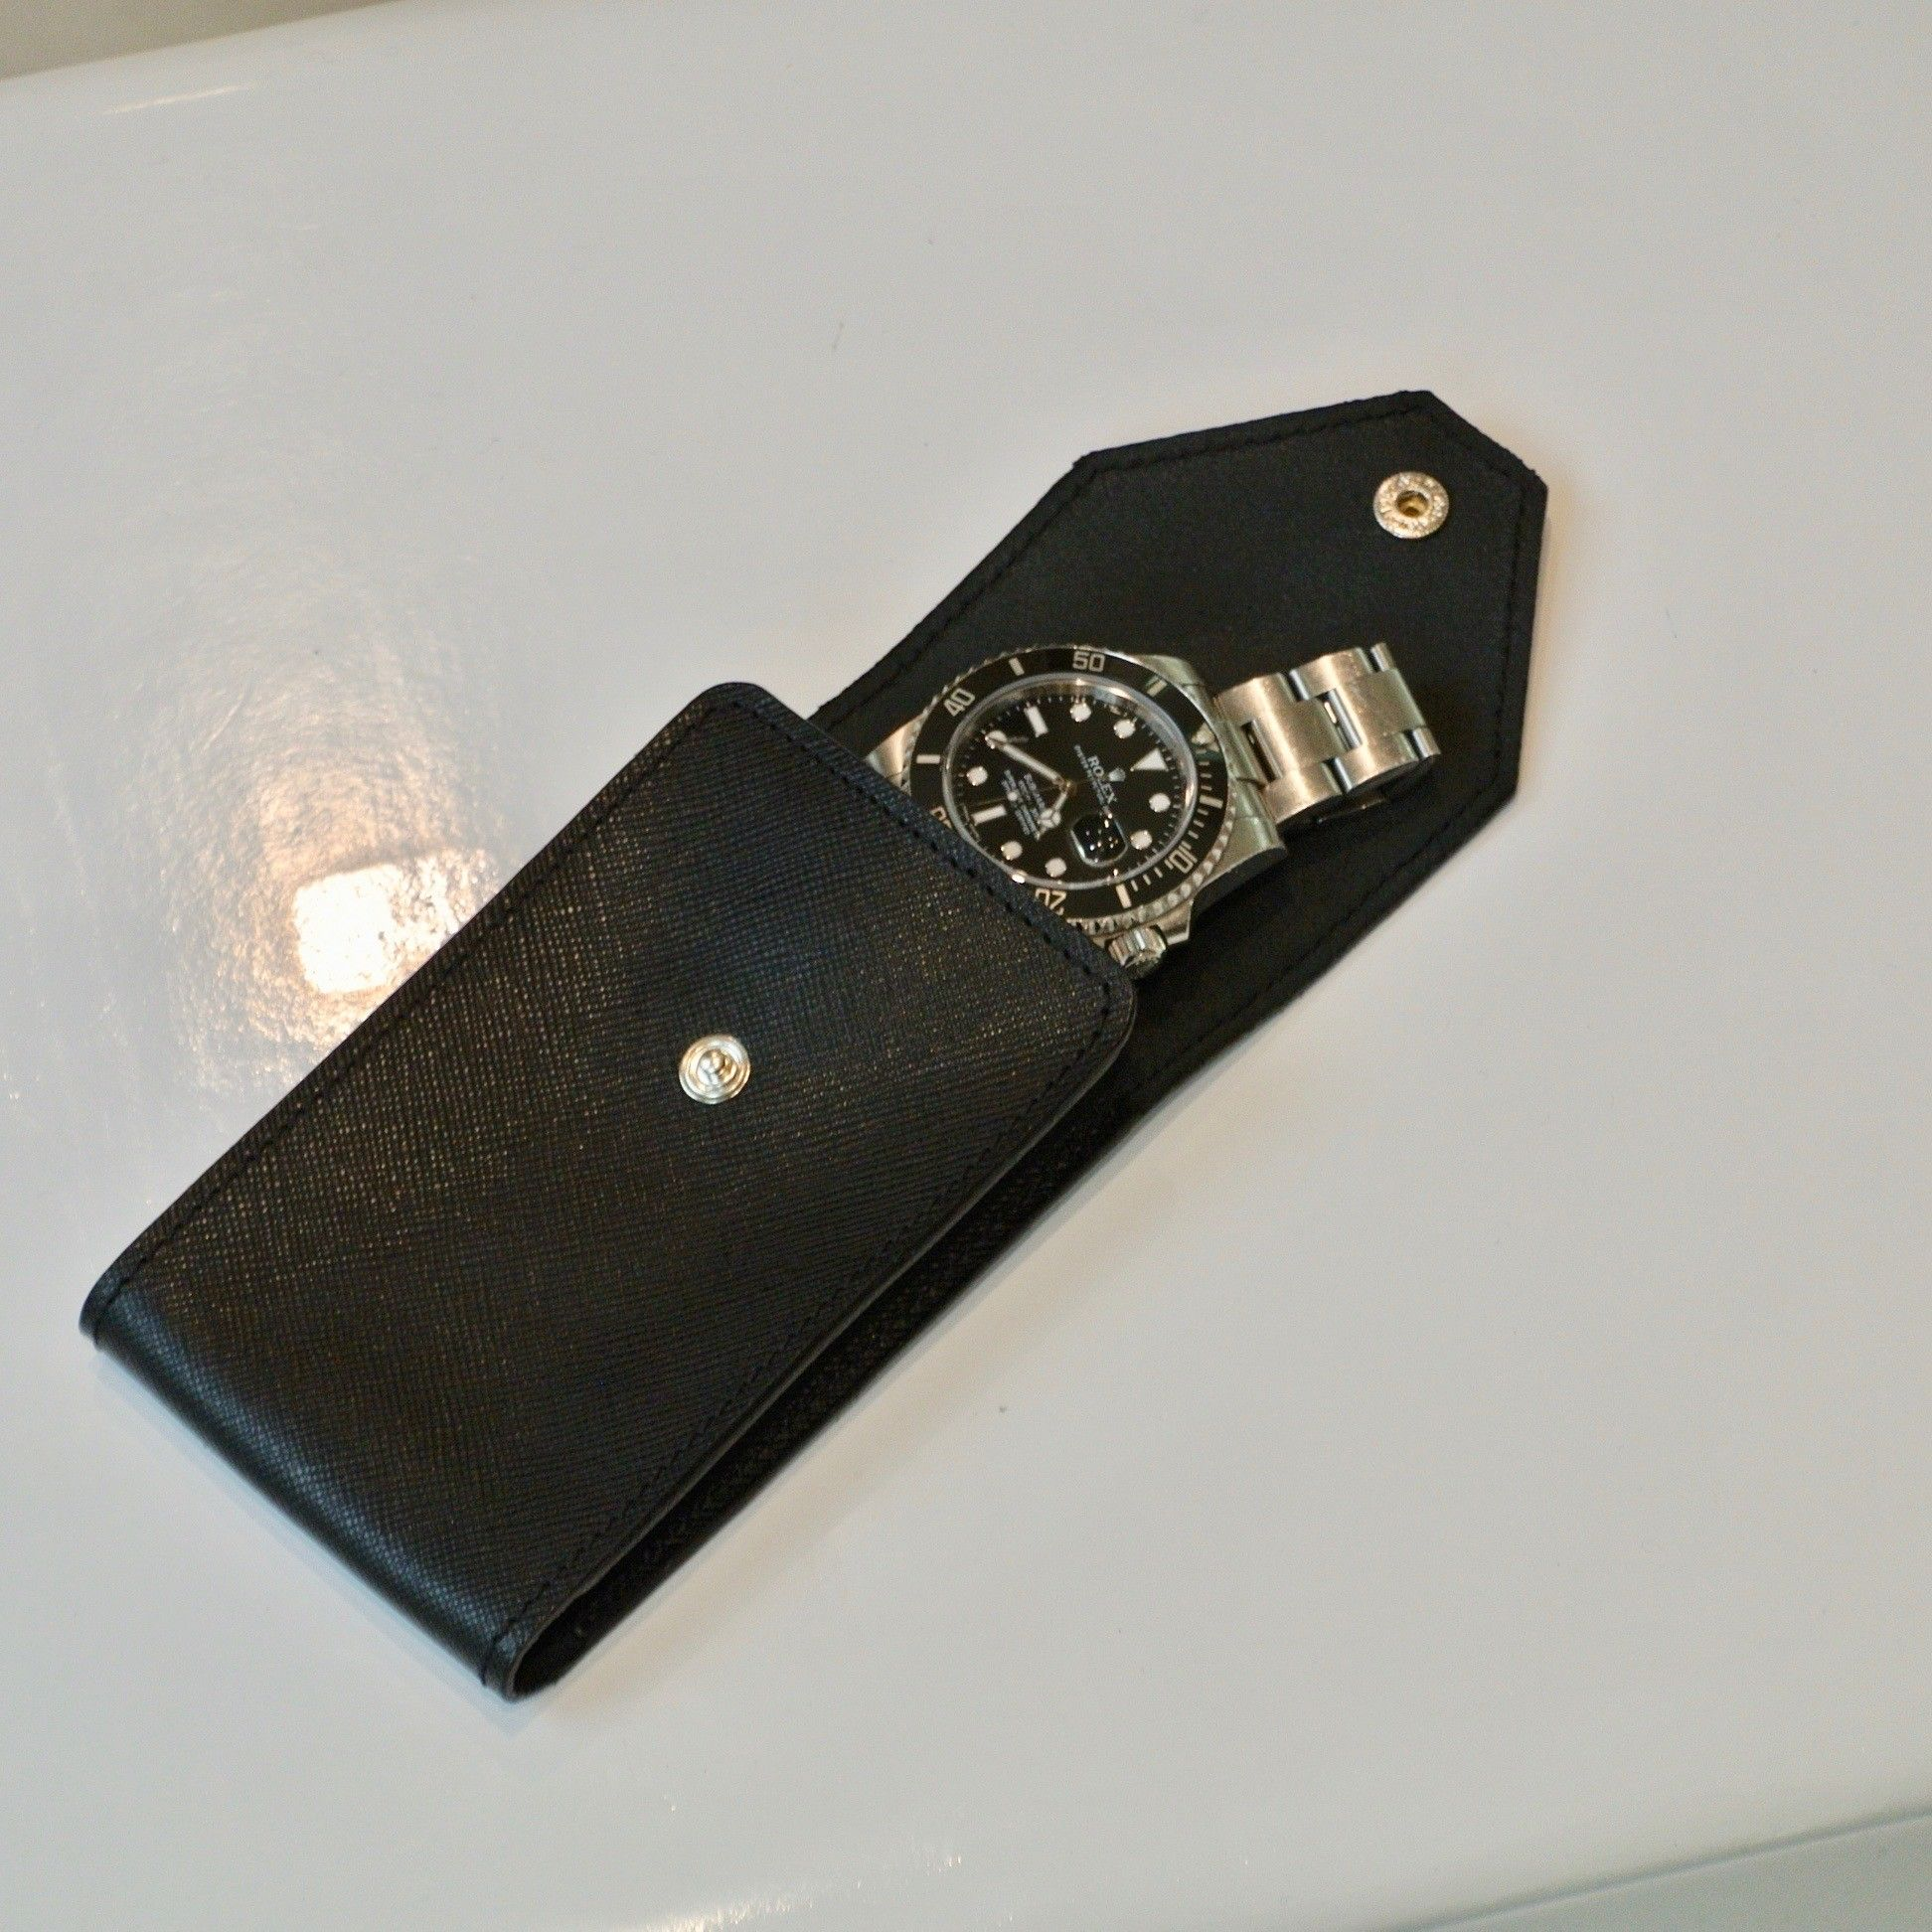 CartTime borsa custodia portaorologi nera safiano 10 posti